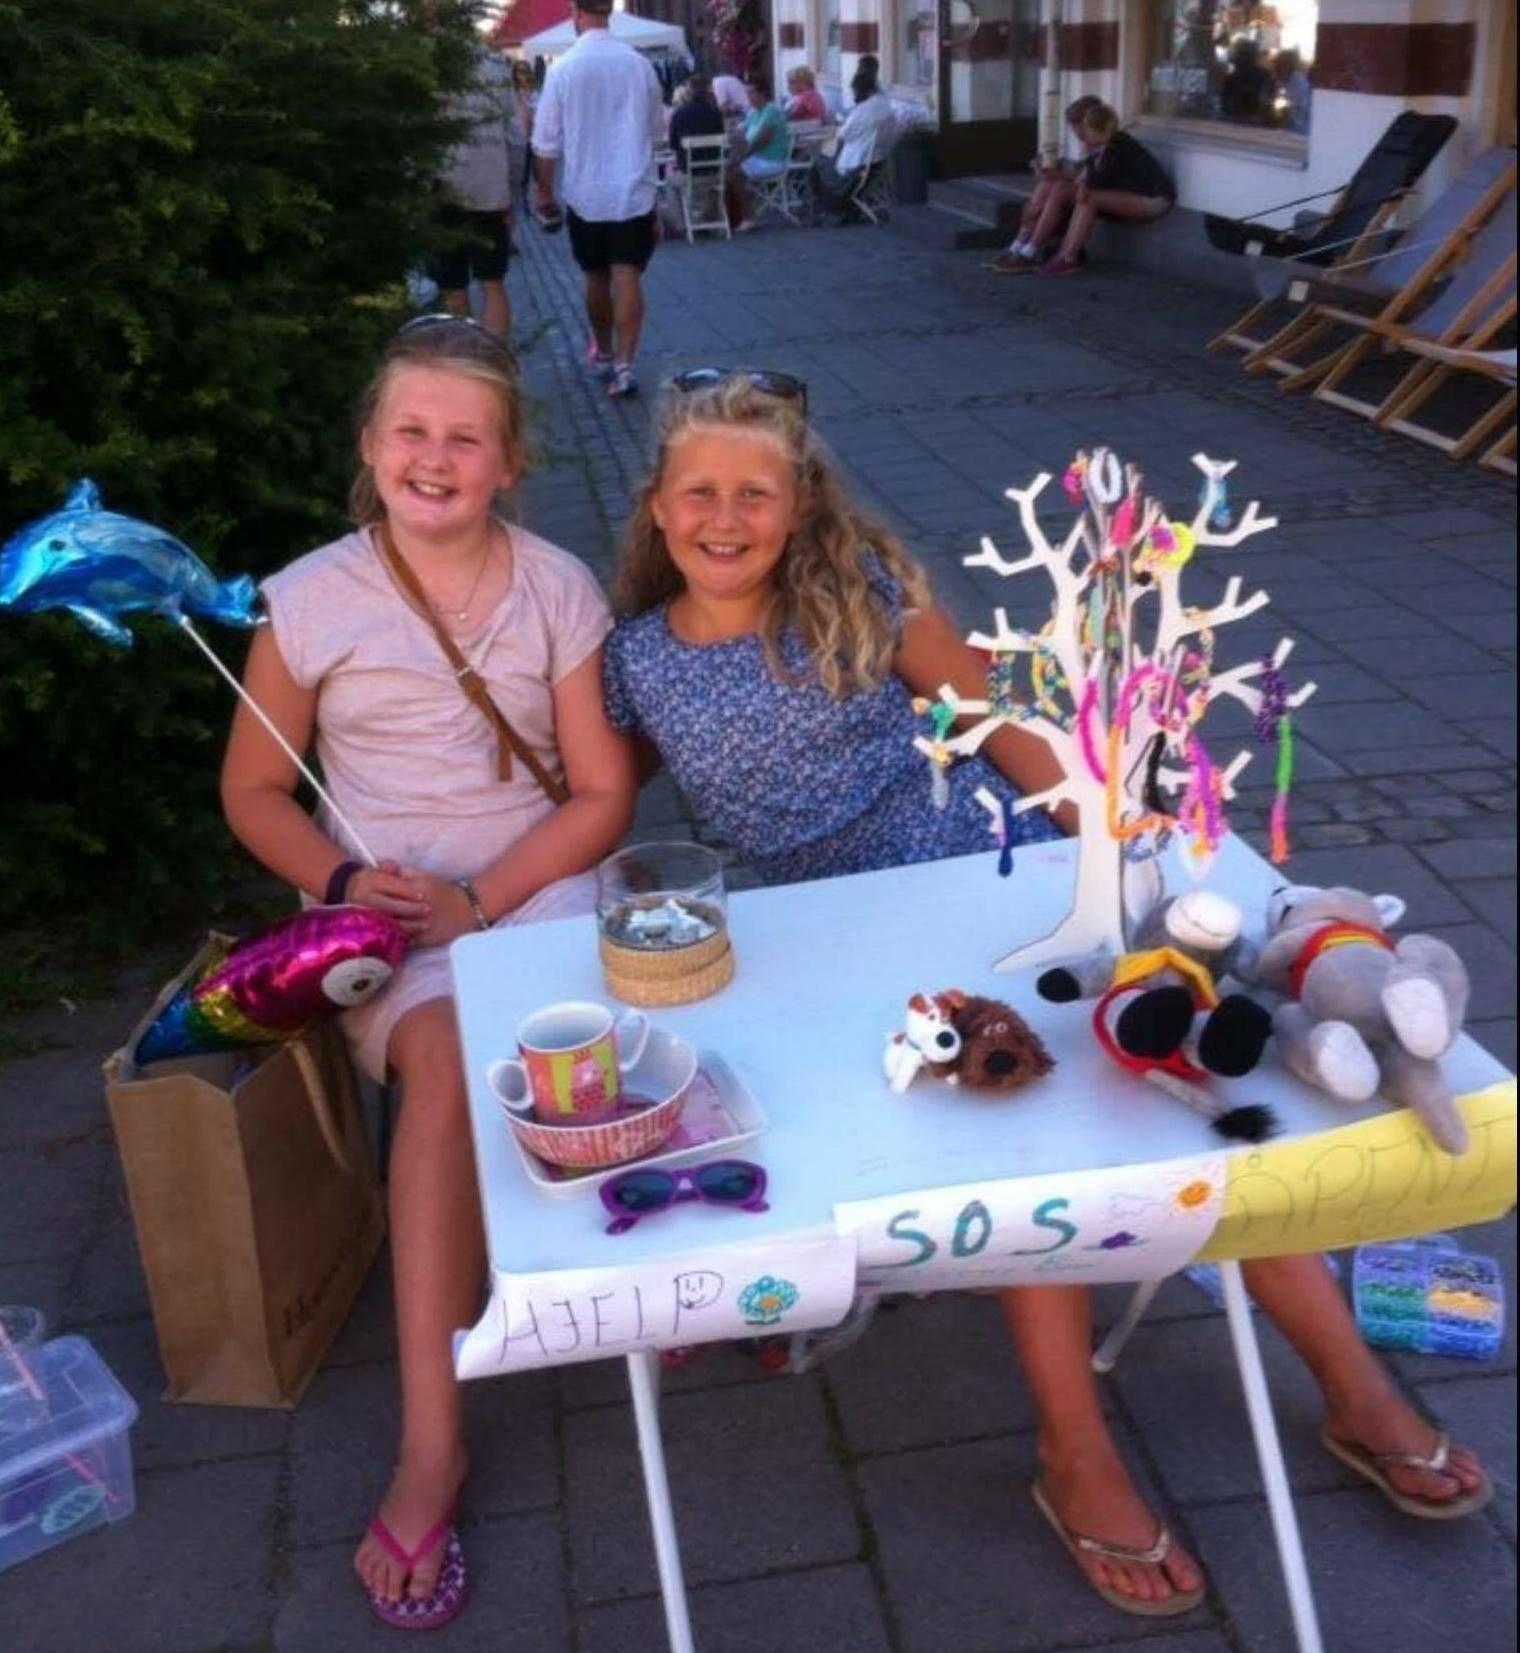 Pernille_and_Tuva_raise_money_to_help_children